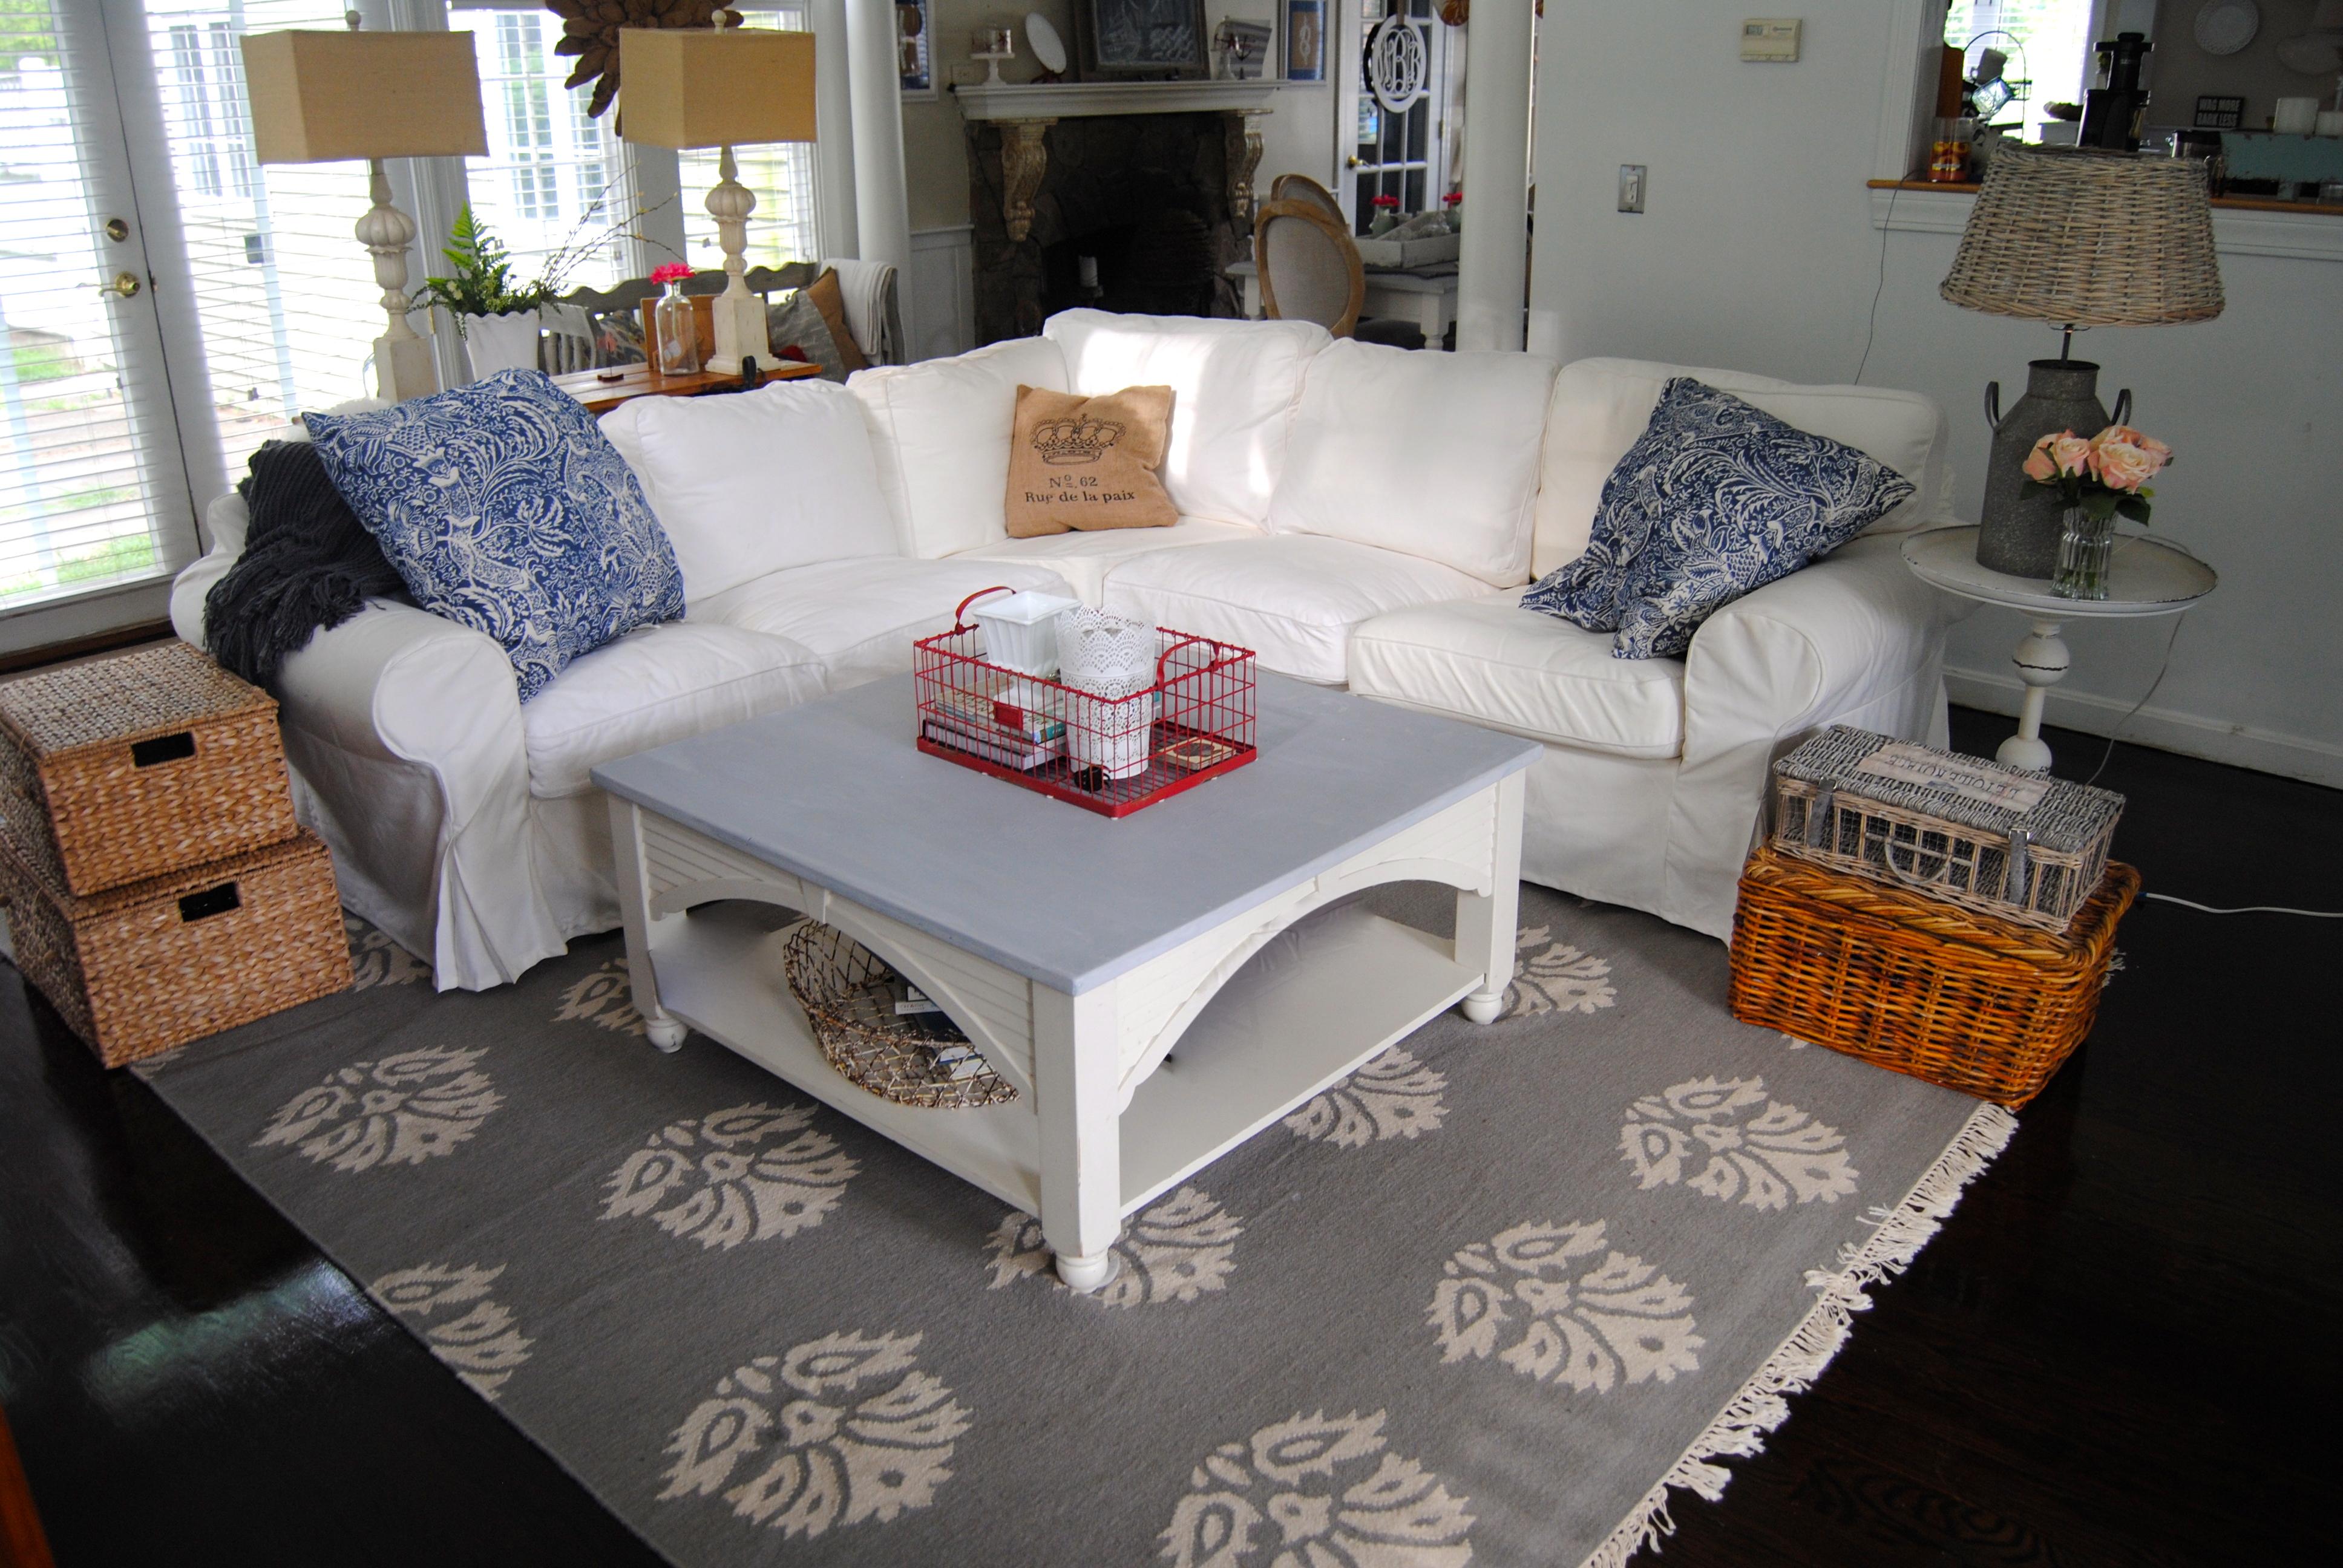 Ikea Ektorp Sectional Slipcover Sofa Finally Our Cape